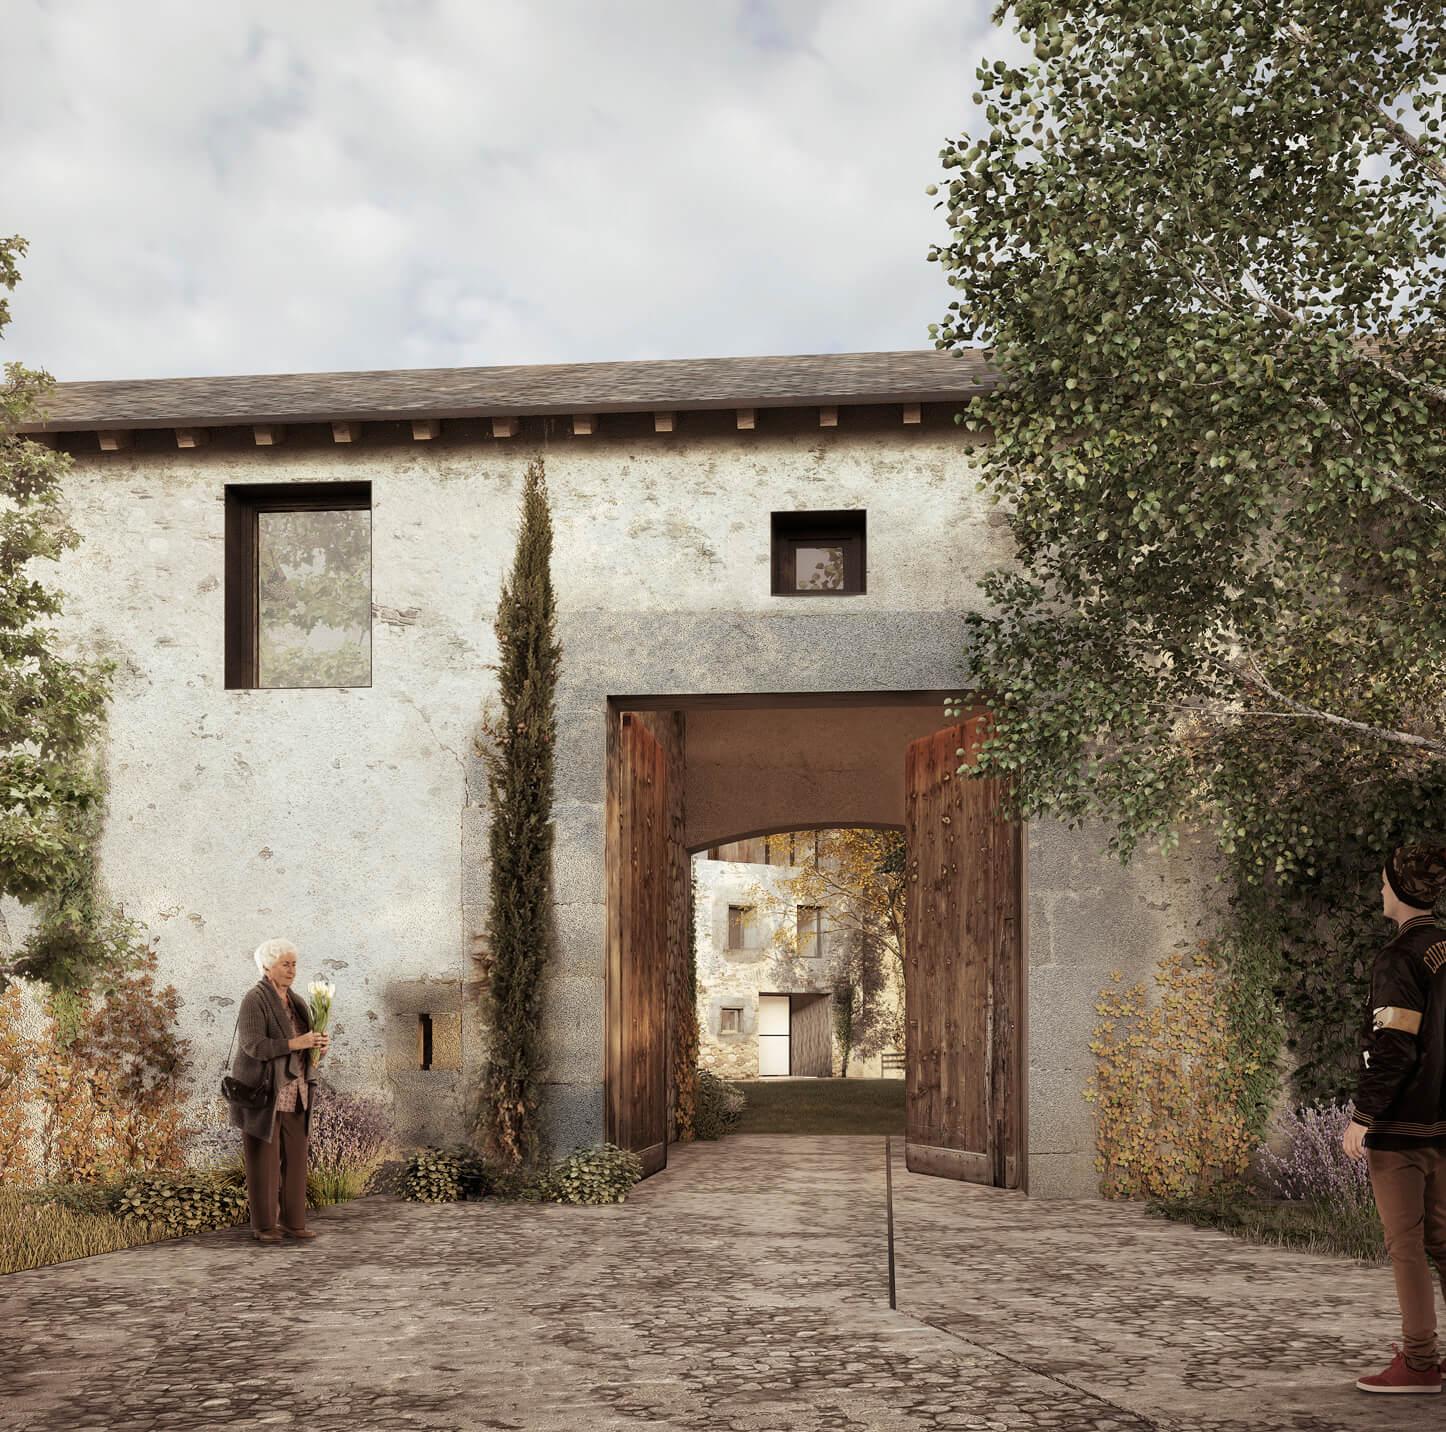 15-Viviendas en Bourg-Madame-CO arquitectura